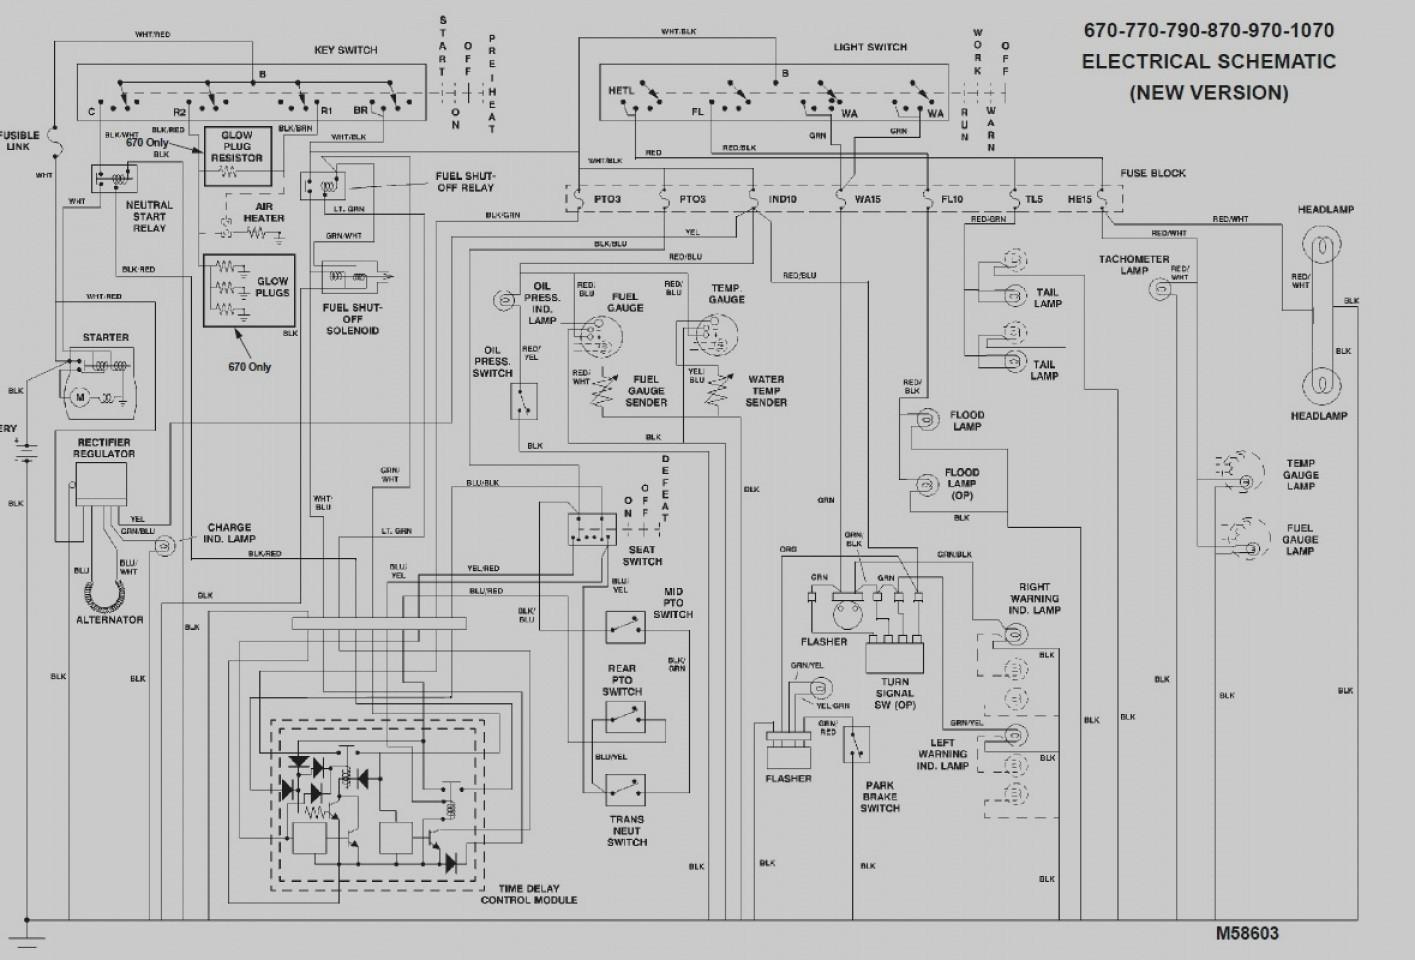 john deere sabre wiring diagram kia rio 2003 radio mower library